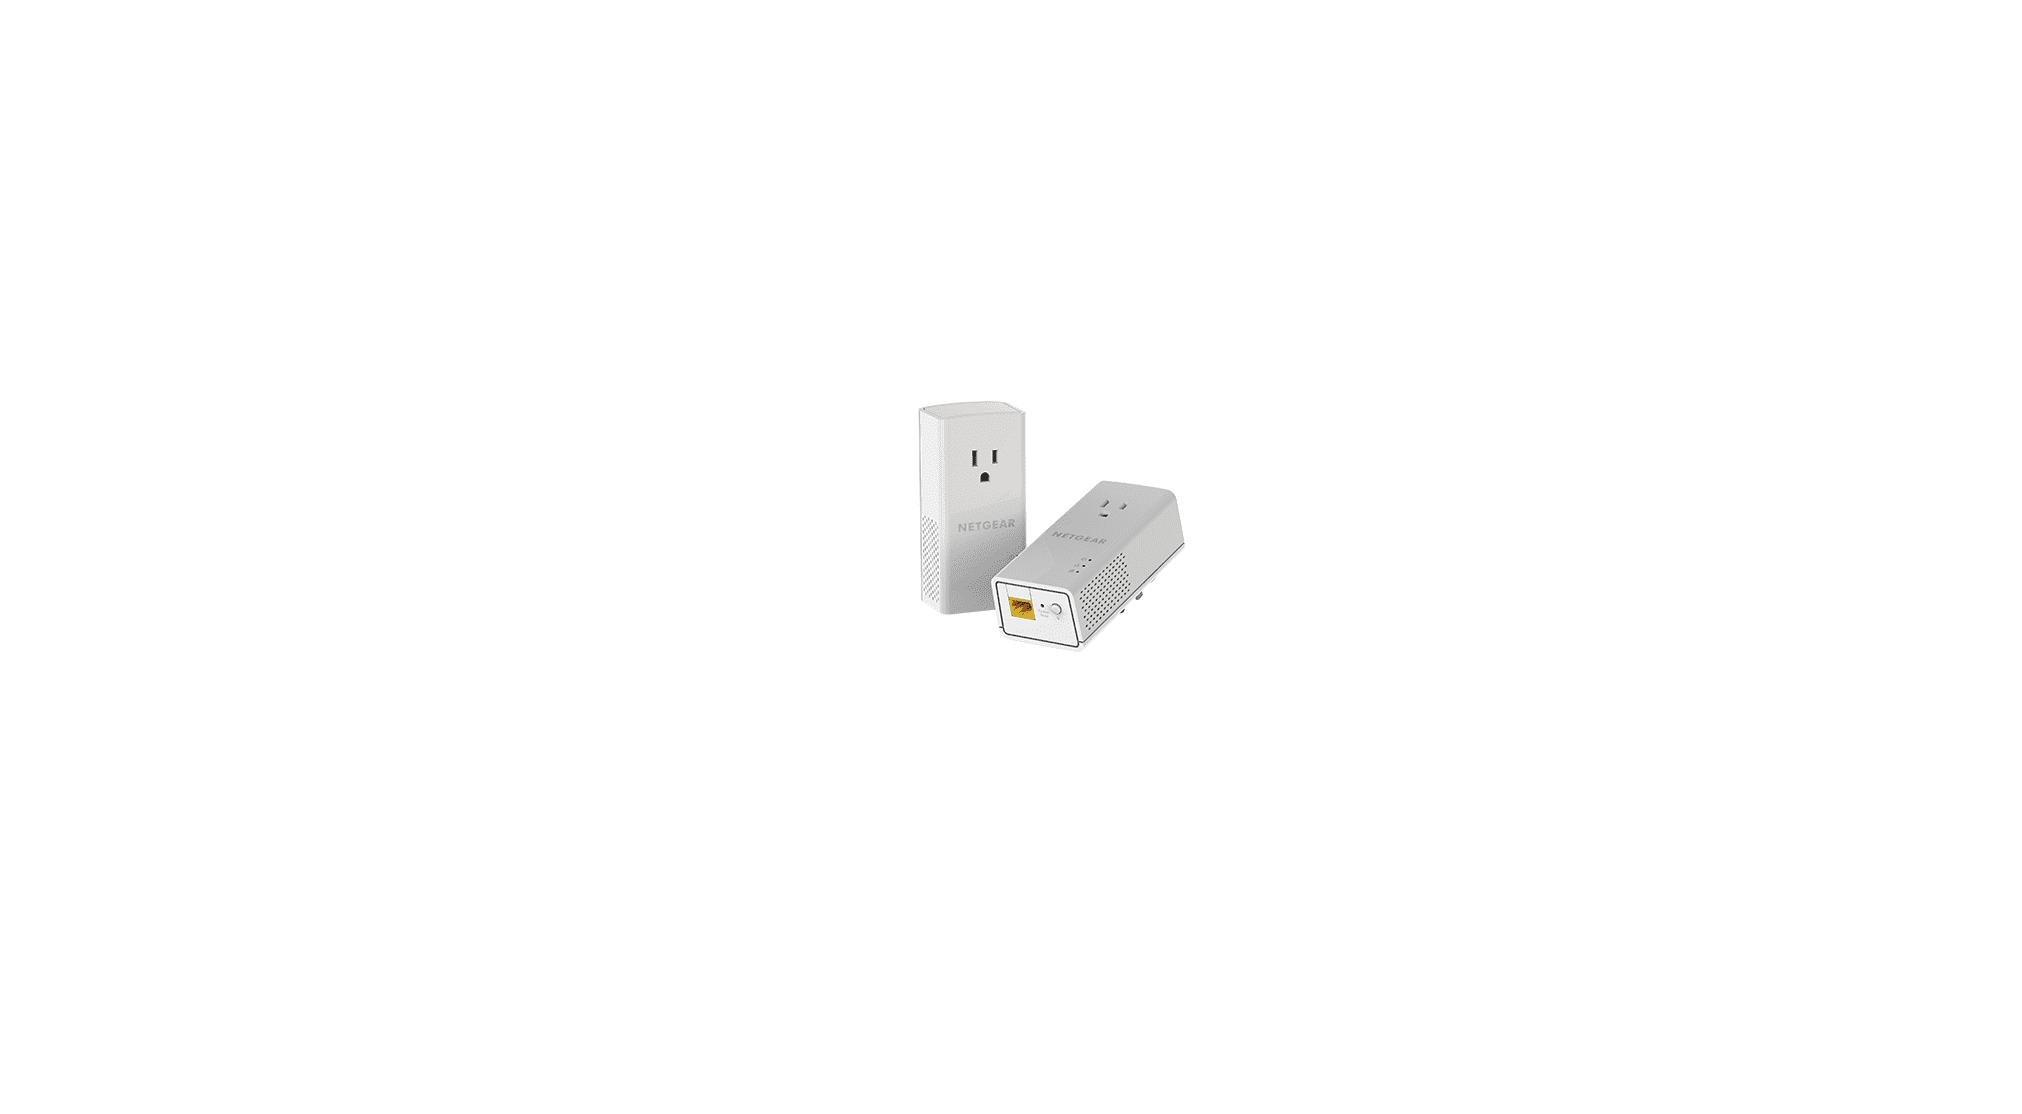 NETGEAR PowerLINE 1000 Mbps, 1 Gigabit Port with Pass